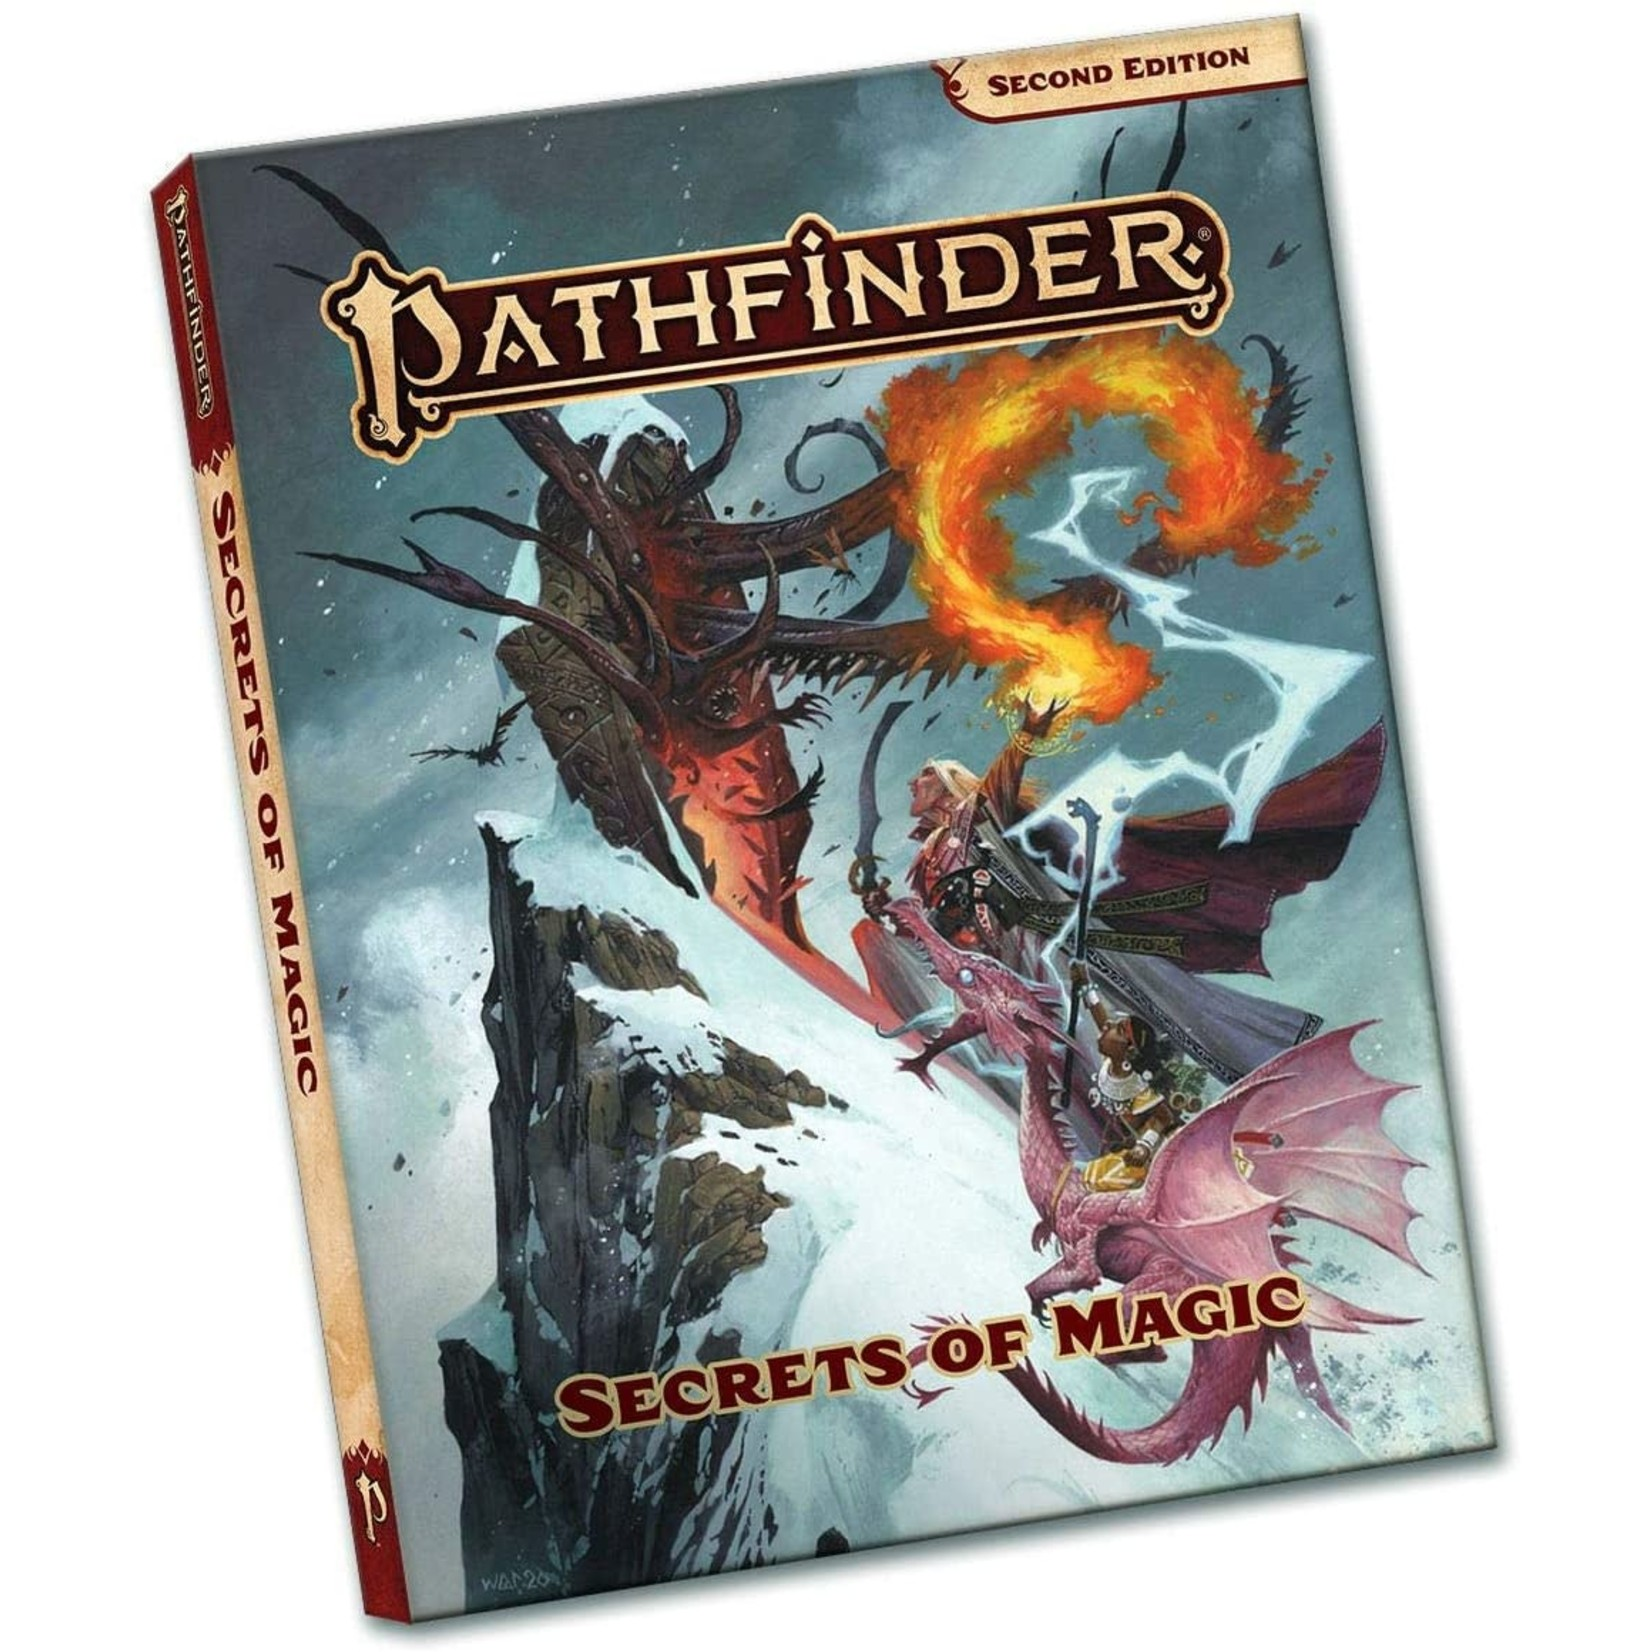 Paizo Pathfinder 2e: Secrets of Magic Pocket Edition